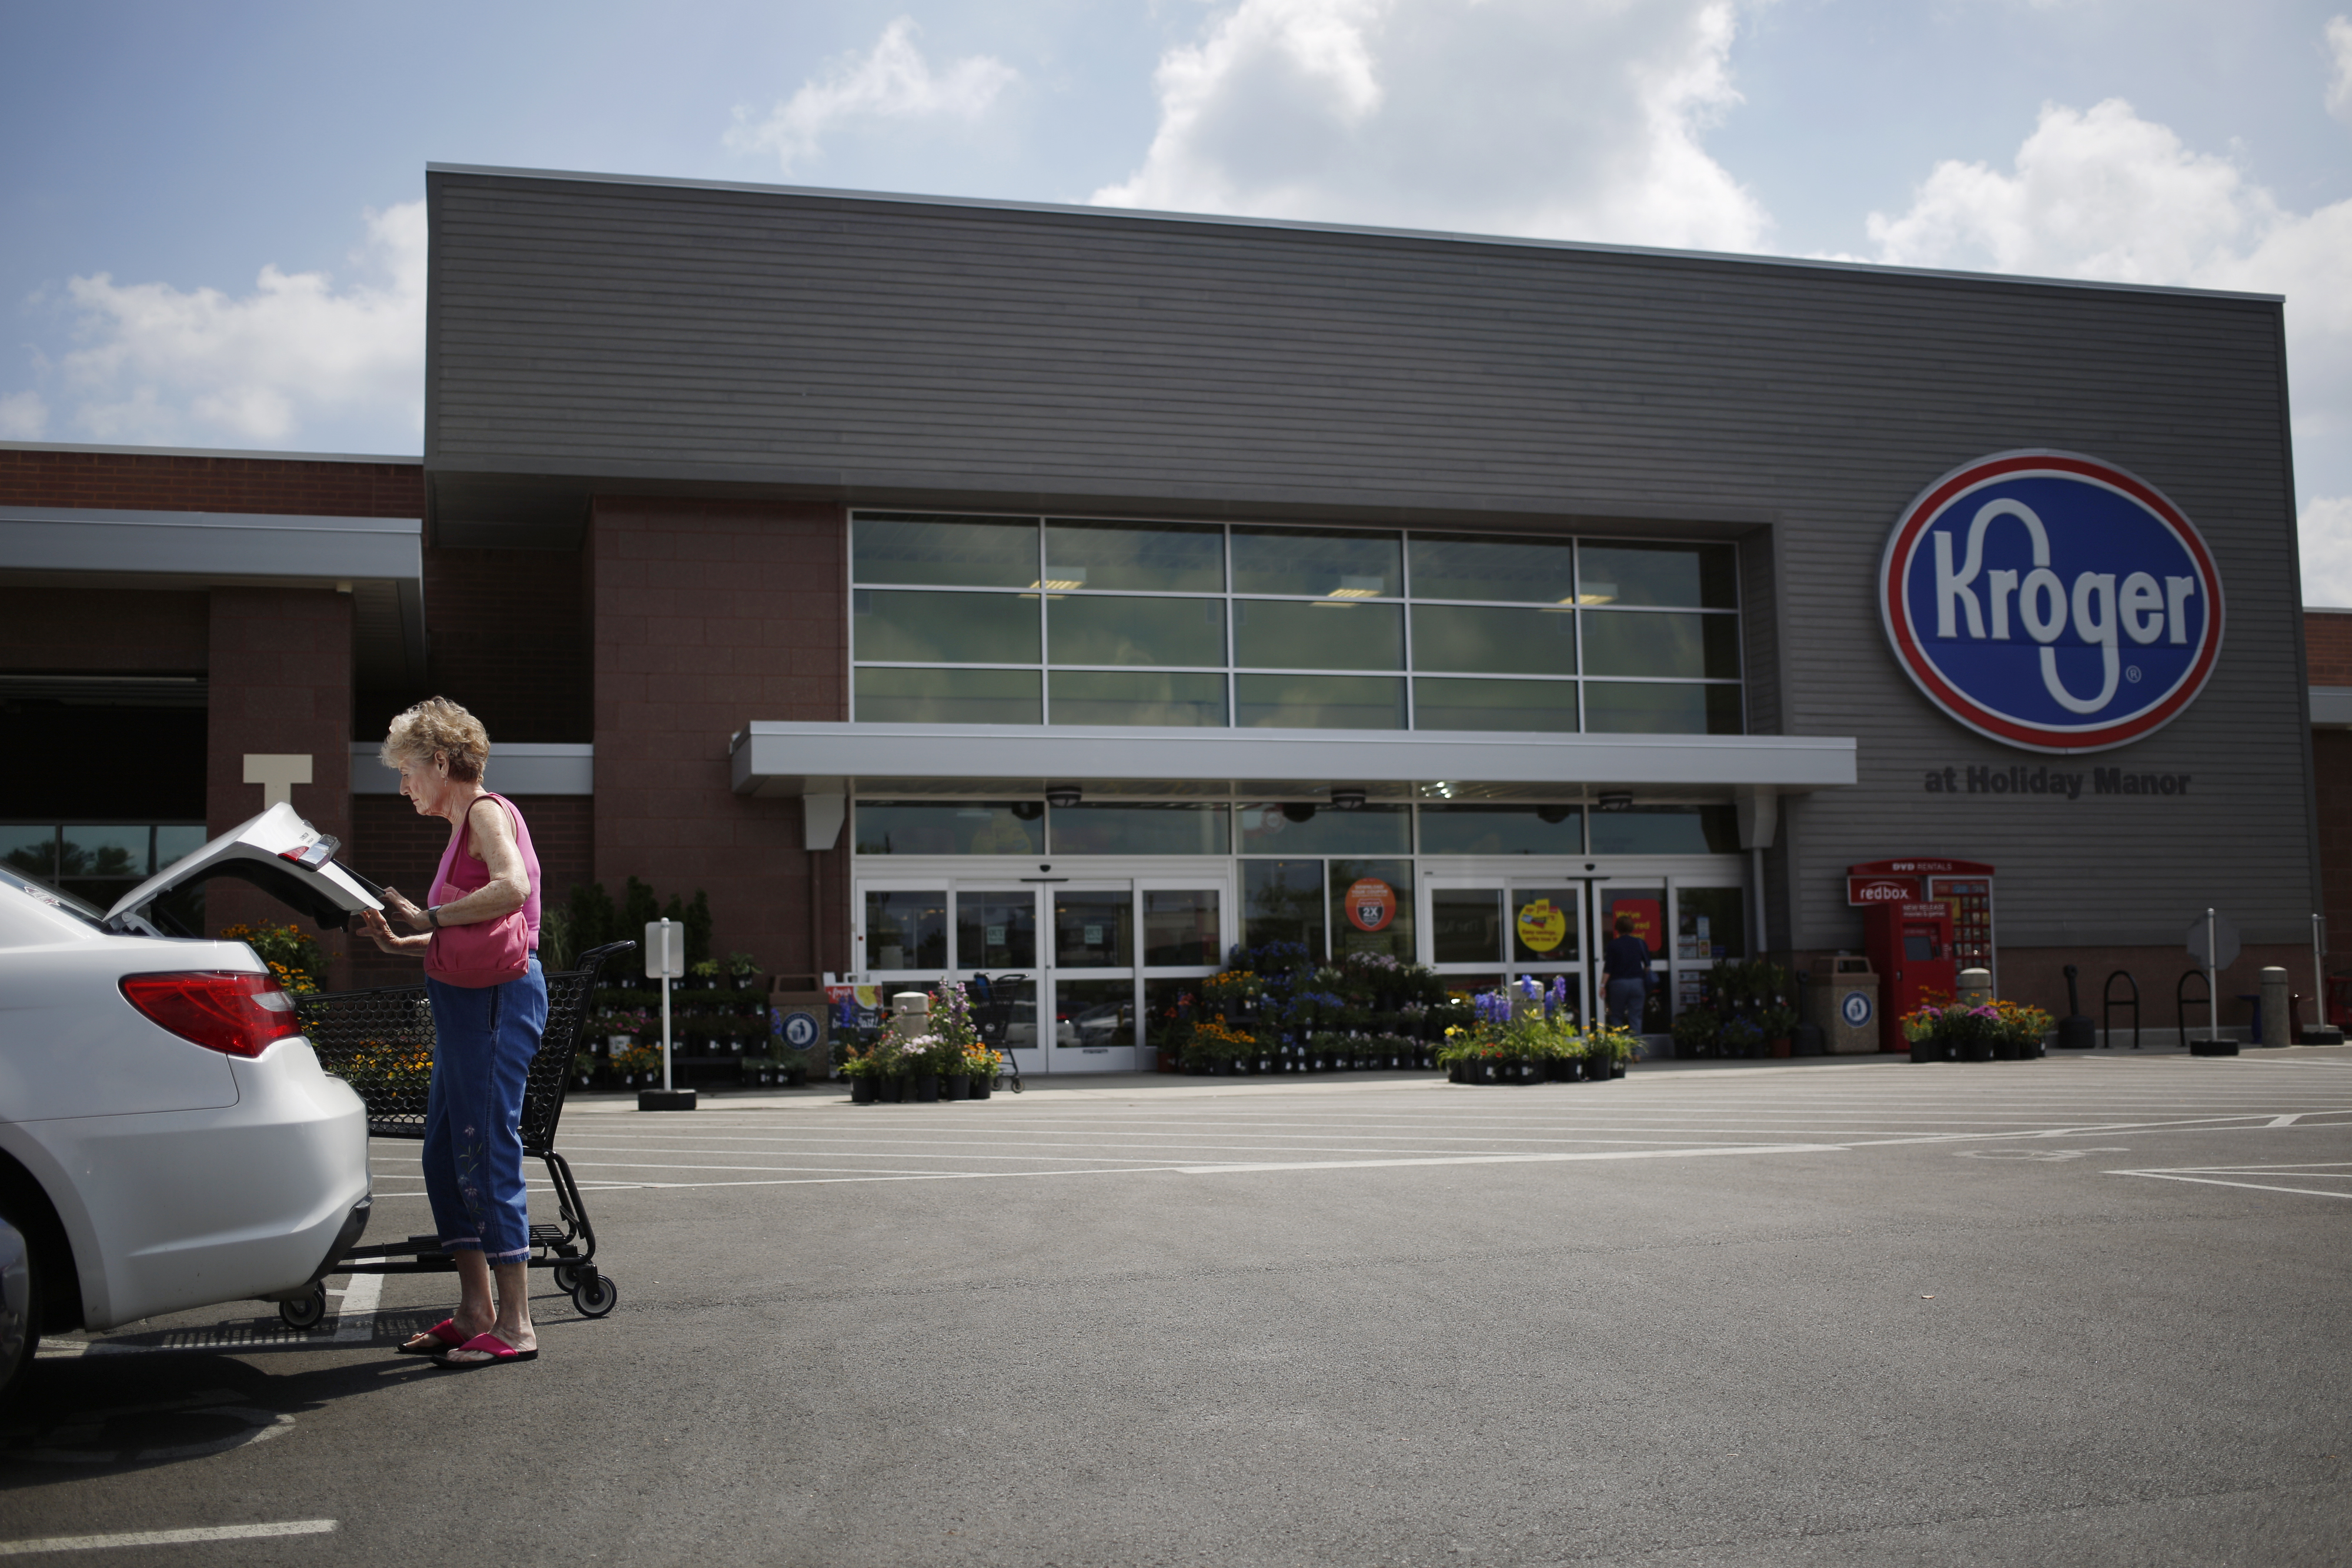 A customer loads groceries into a car outside a Kroger Co. grocery store in Louisville, Kentucky, U.S., on Wednesday, June 14, 2017.